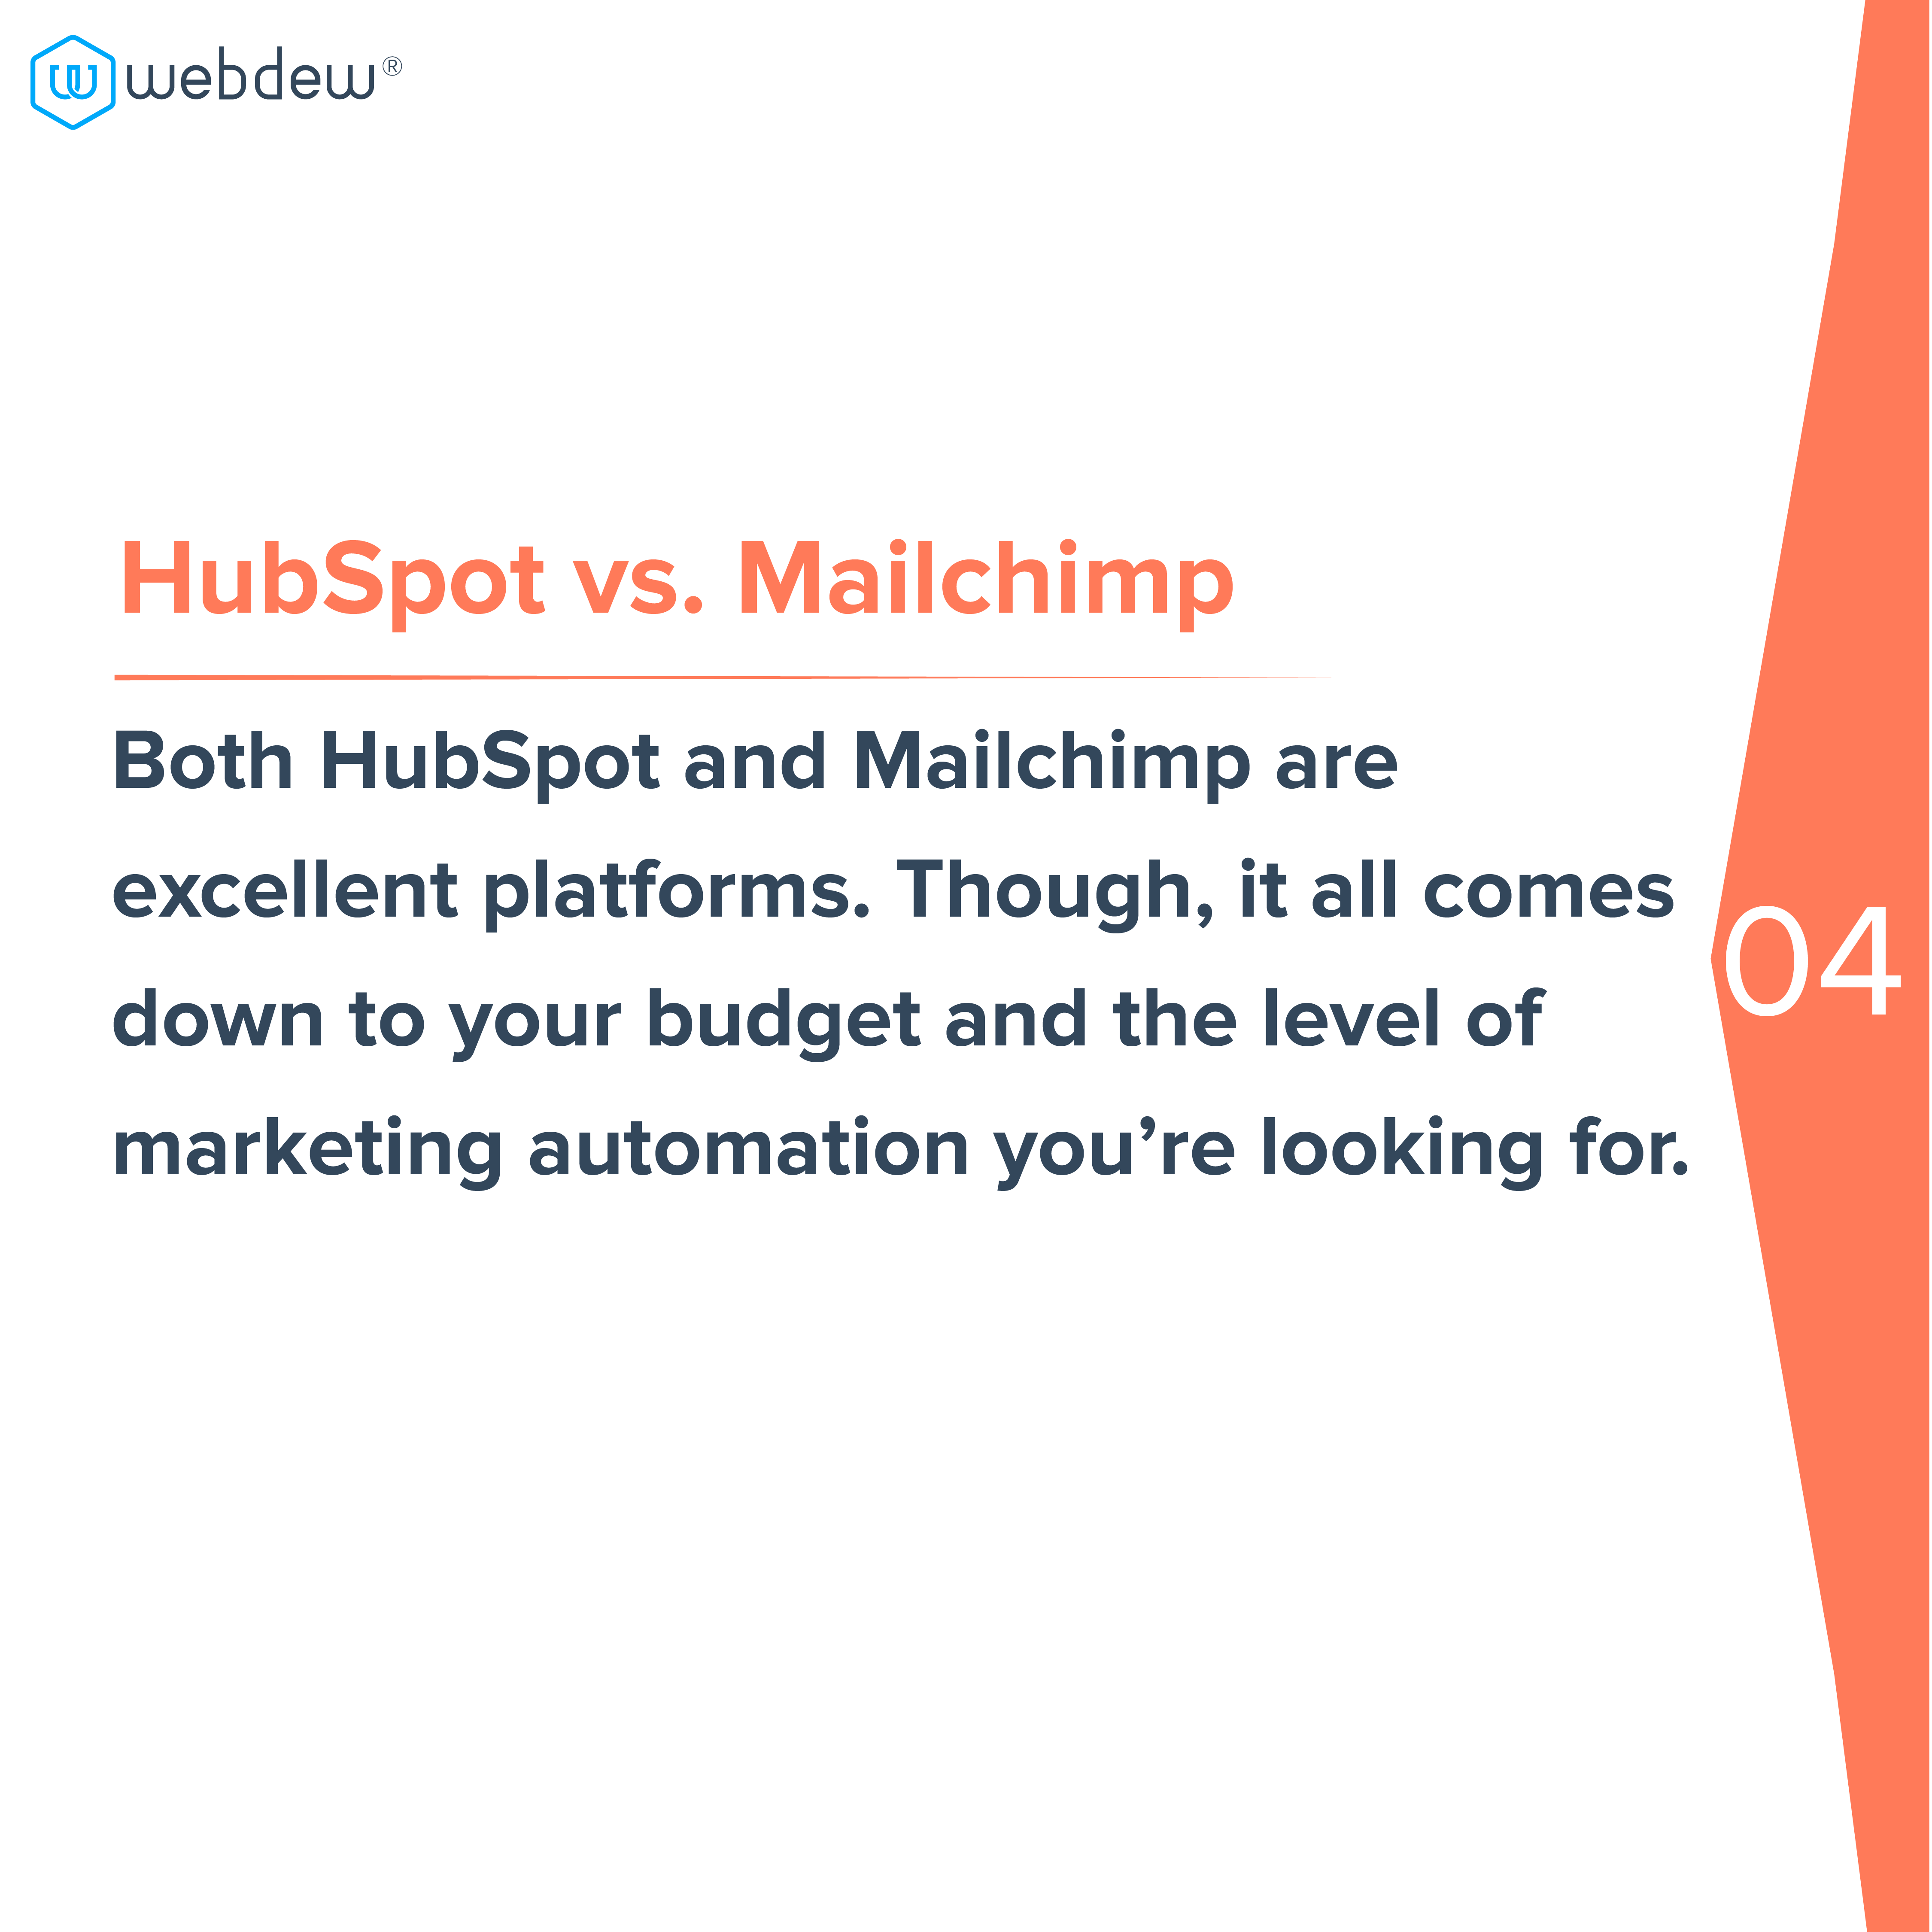 5. hubspot vs mailchimp